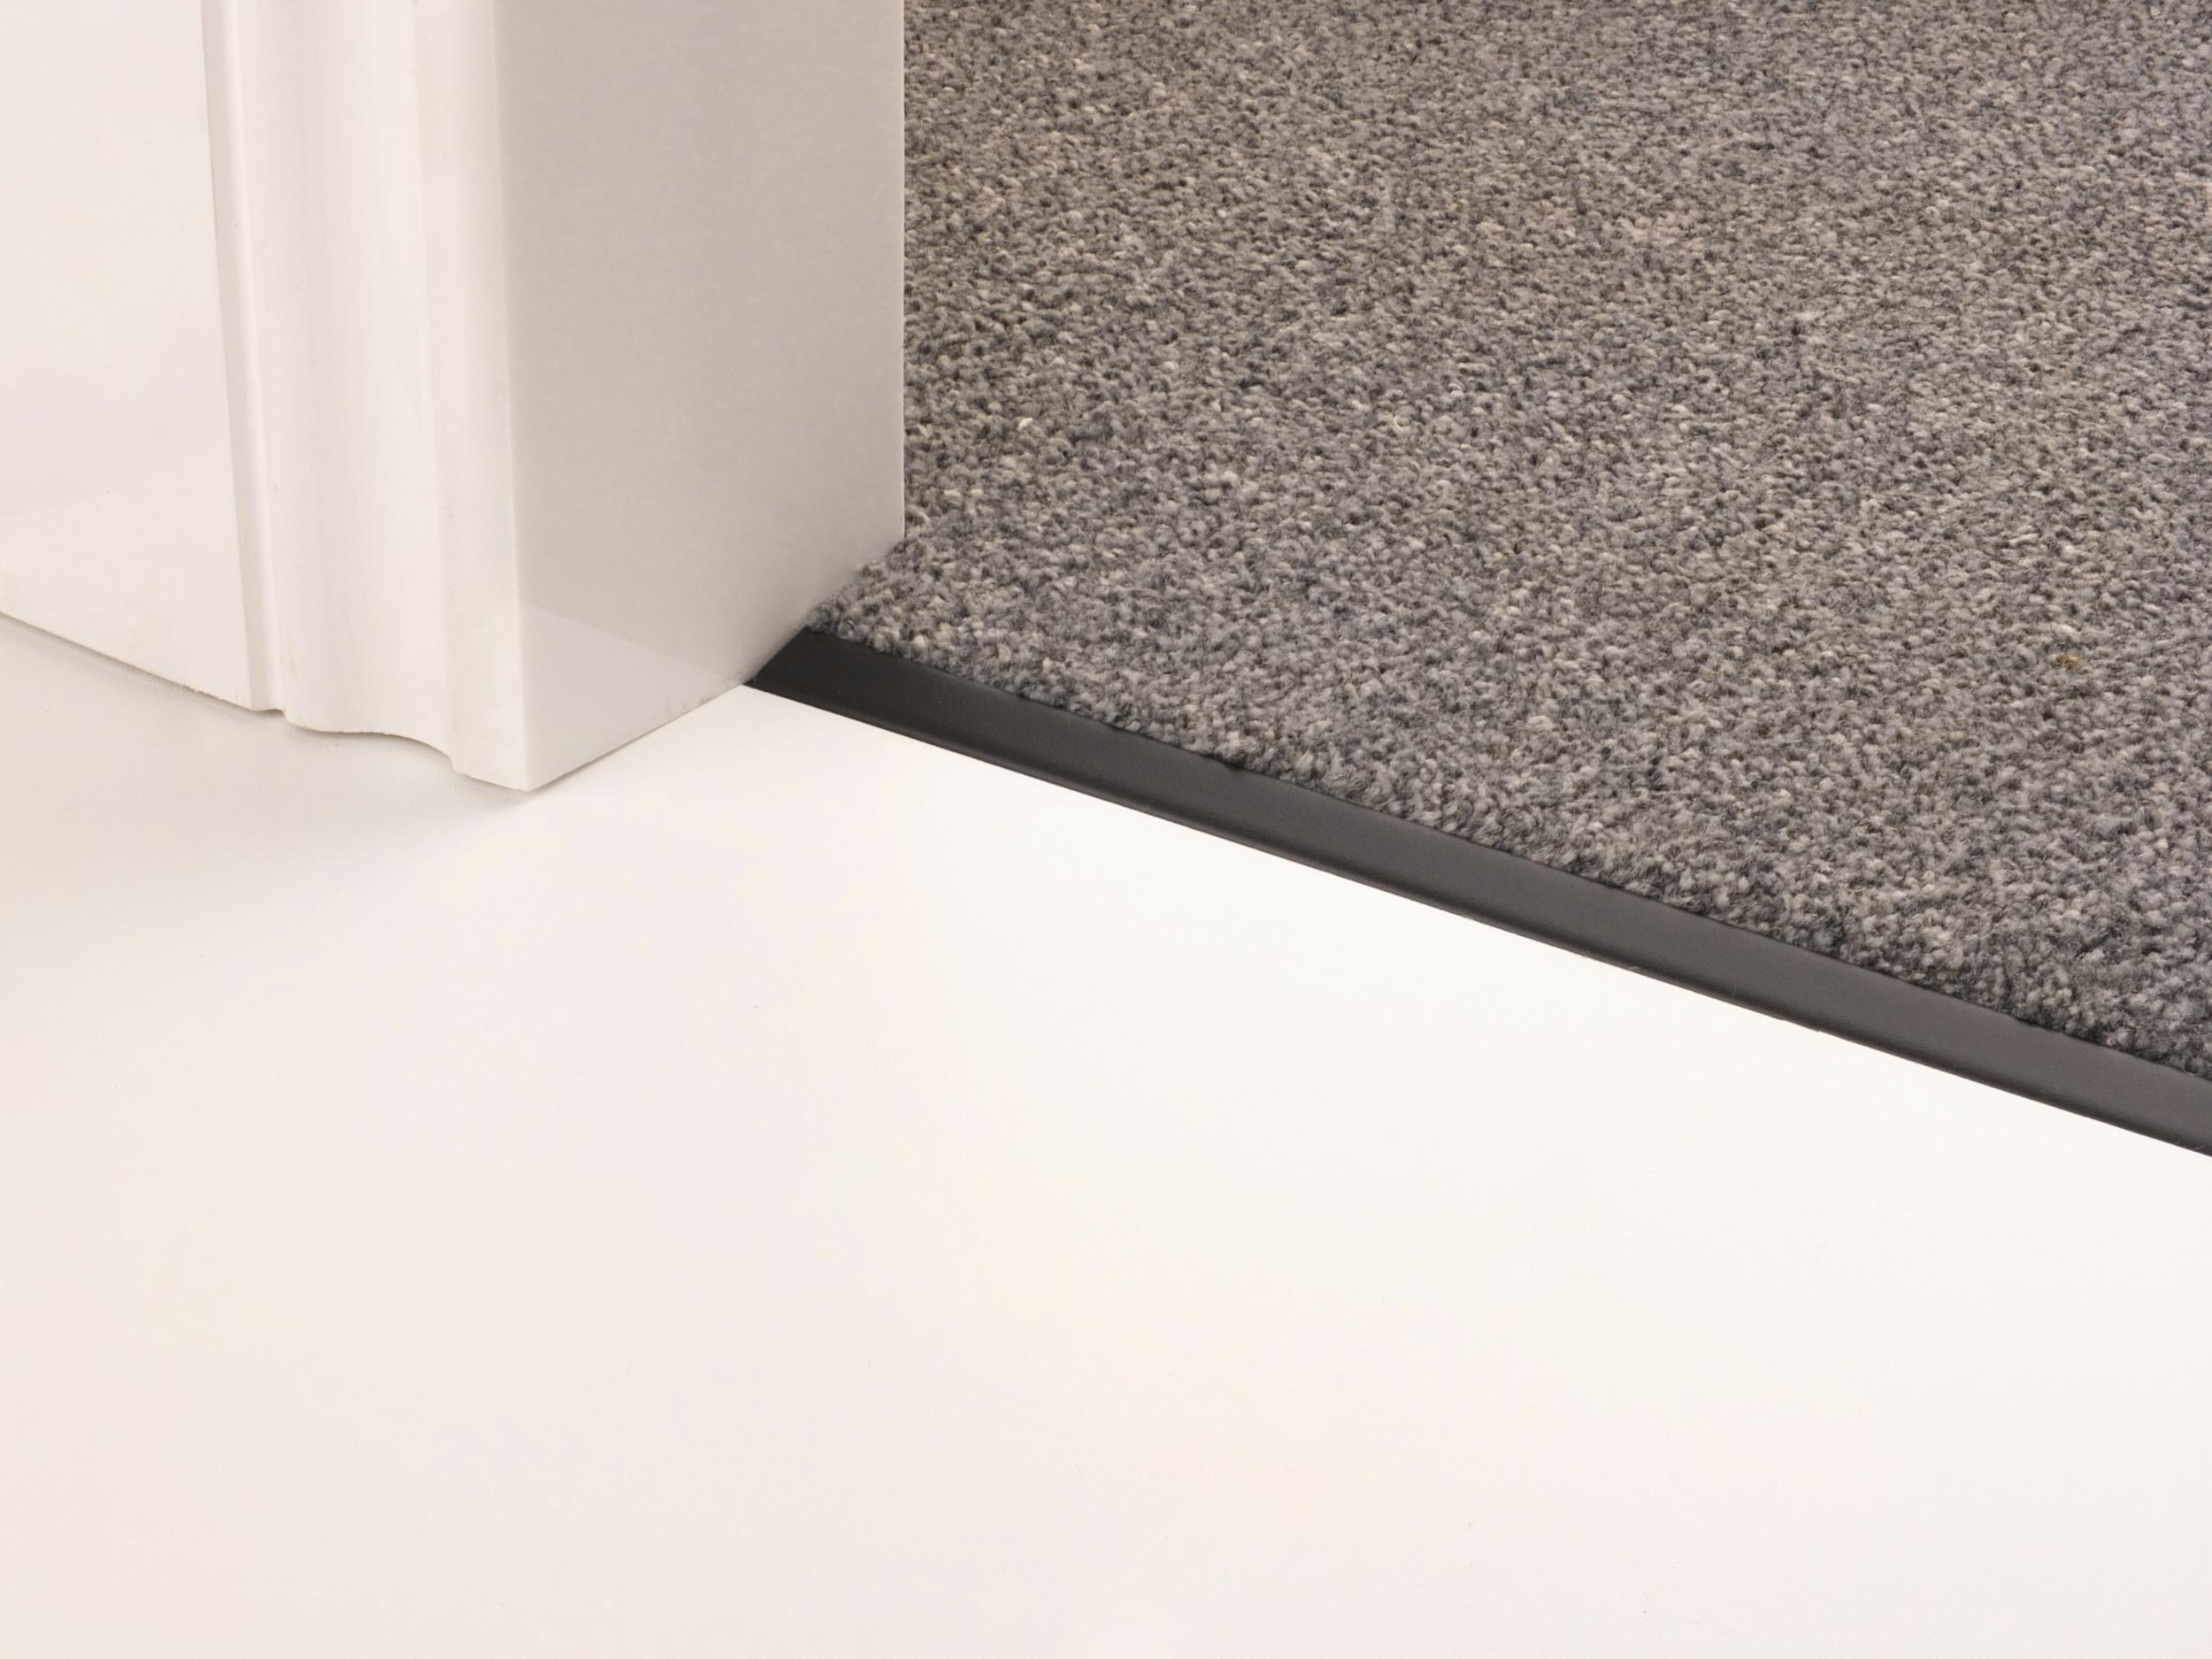 stairrods-doorbar-black-square.jpg